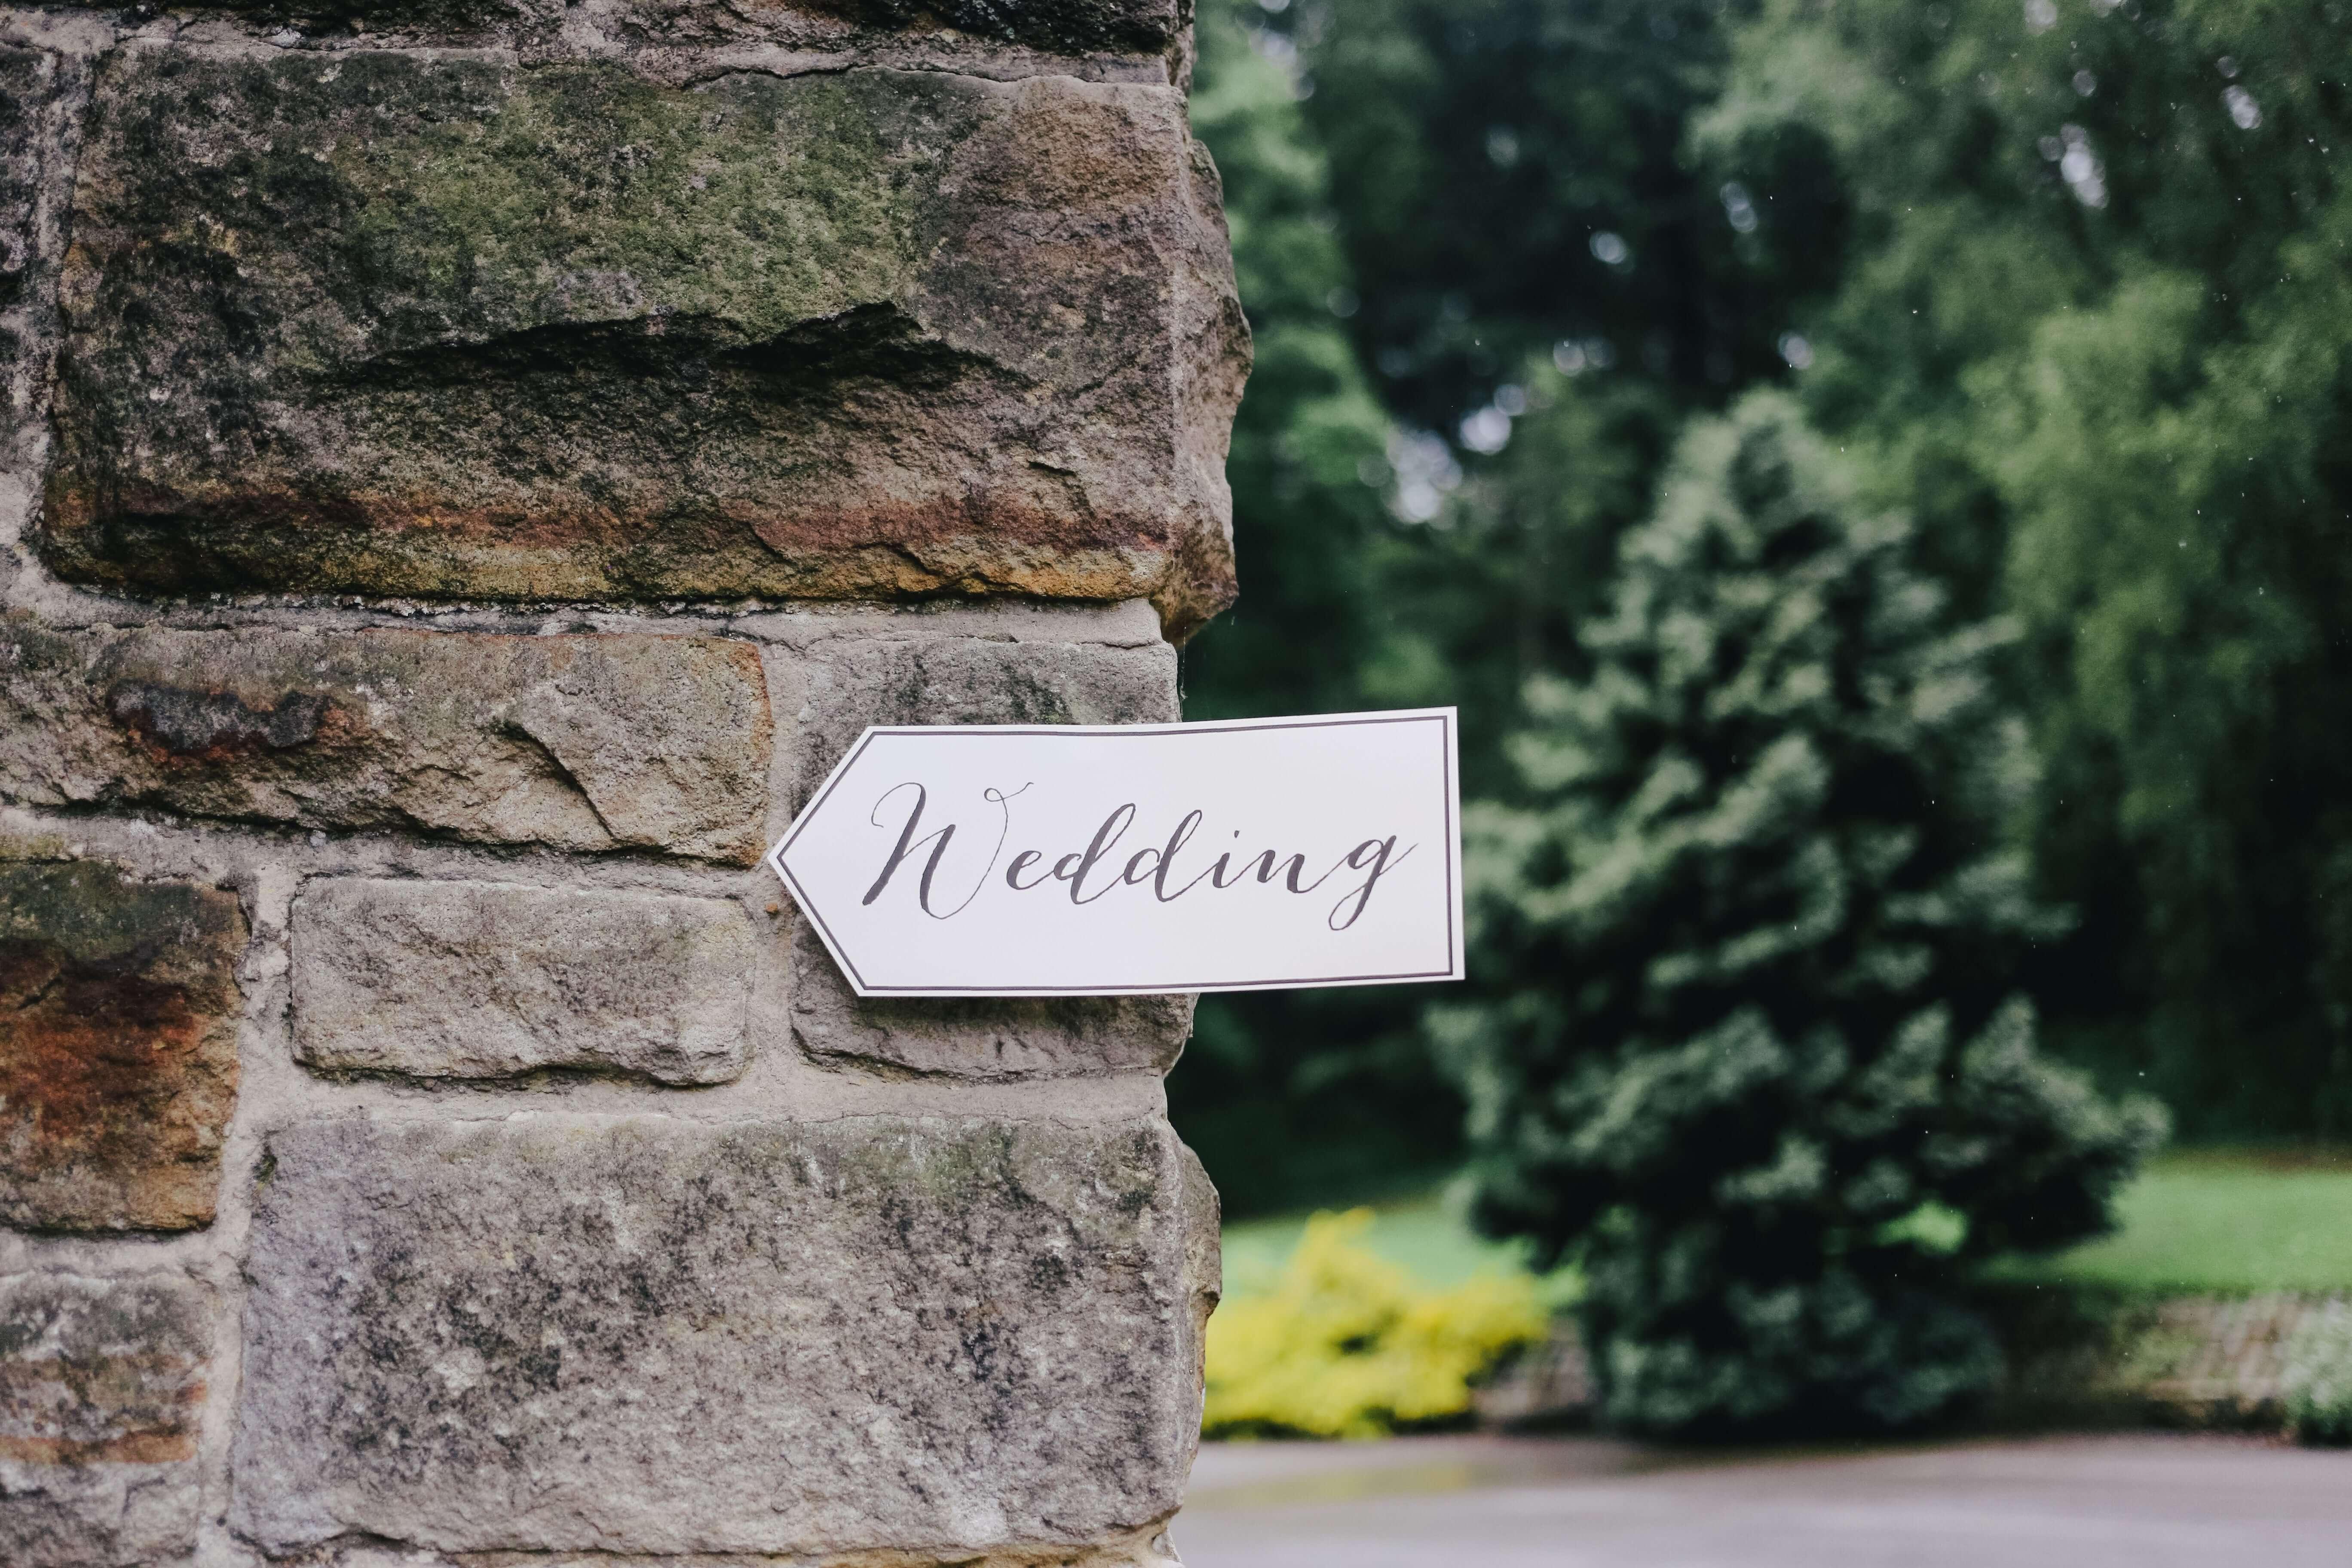 Wedding sign on stone wall